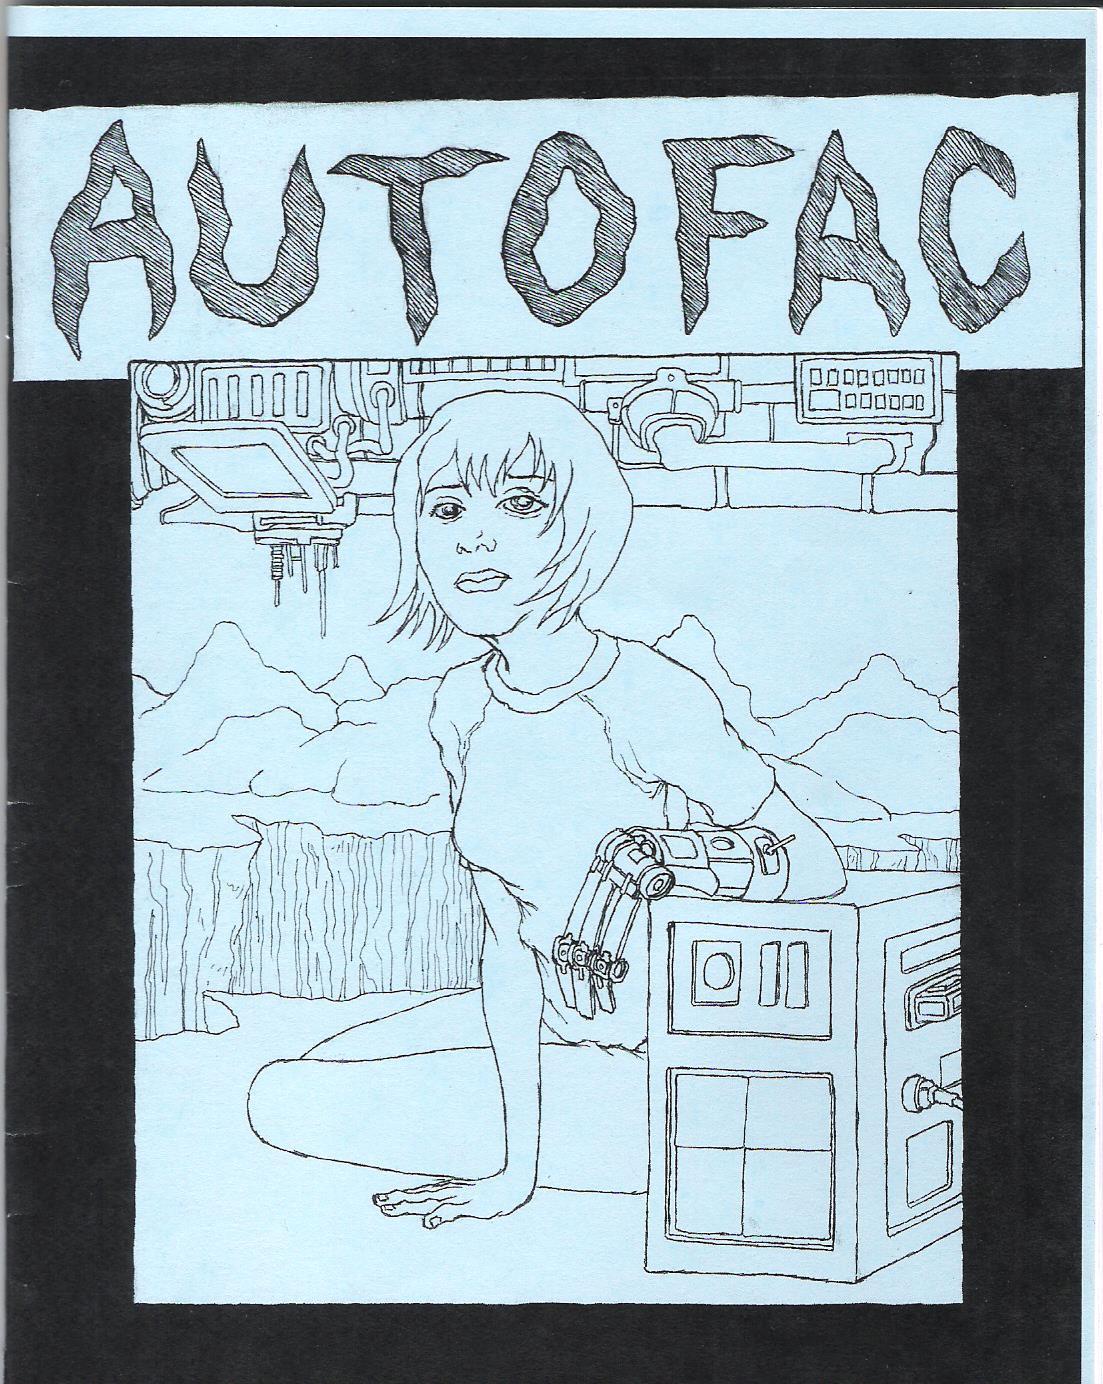 Autofac 002.jpg